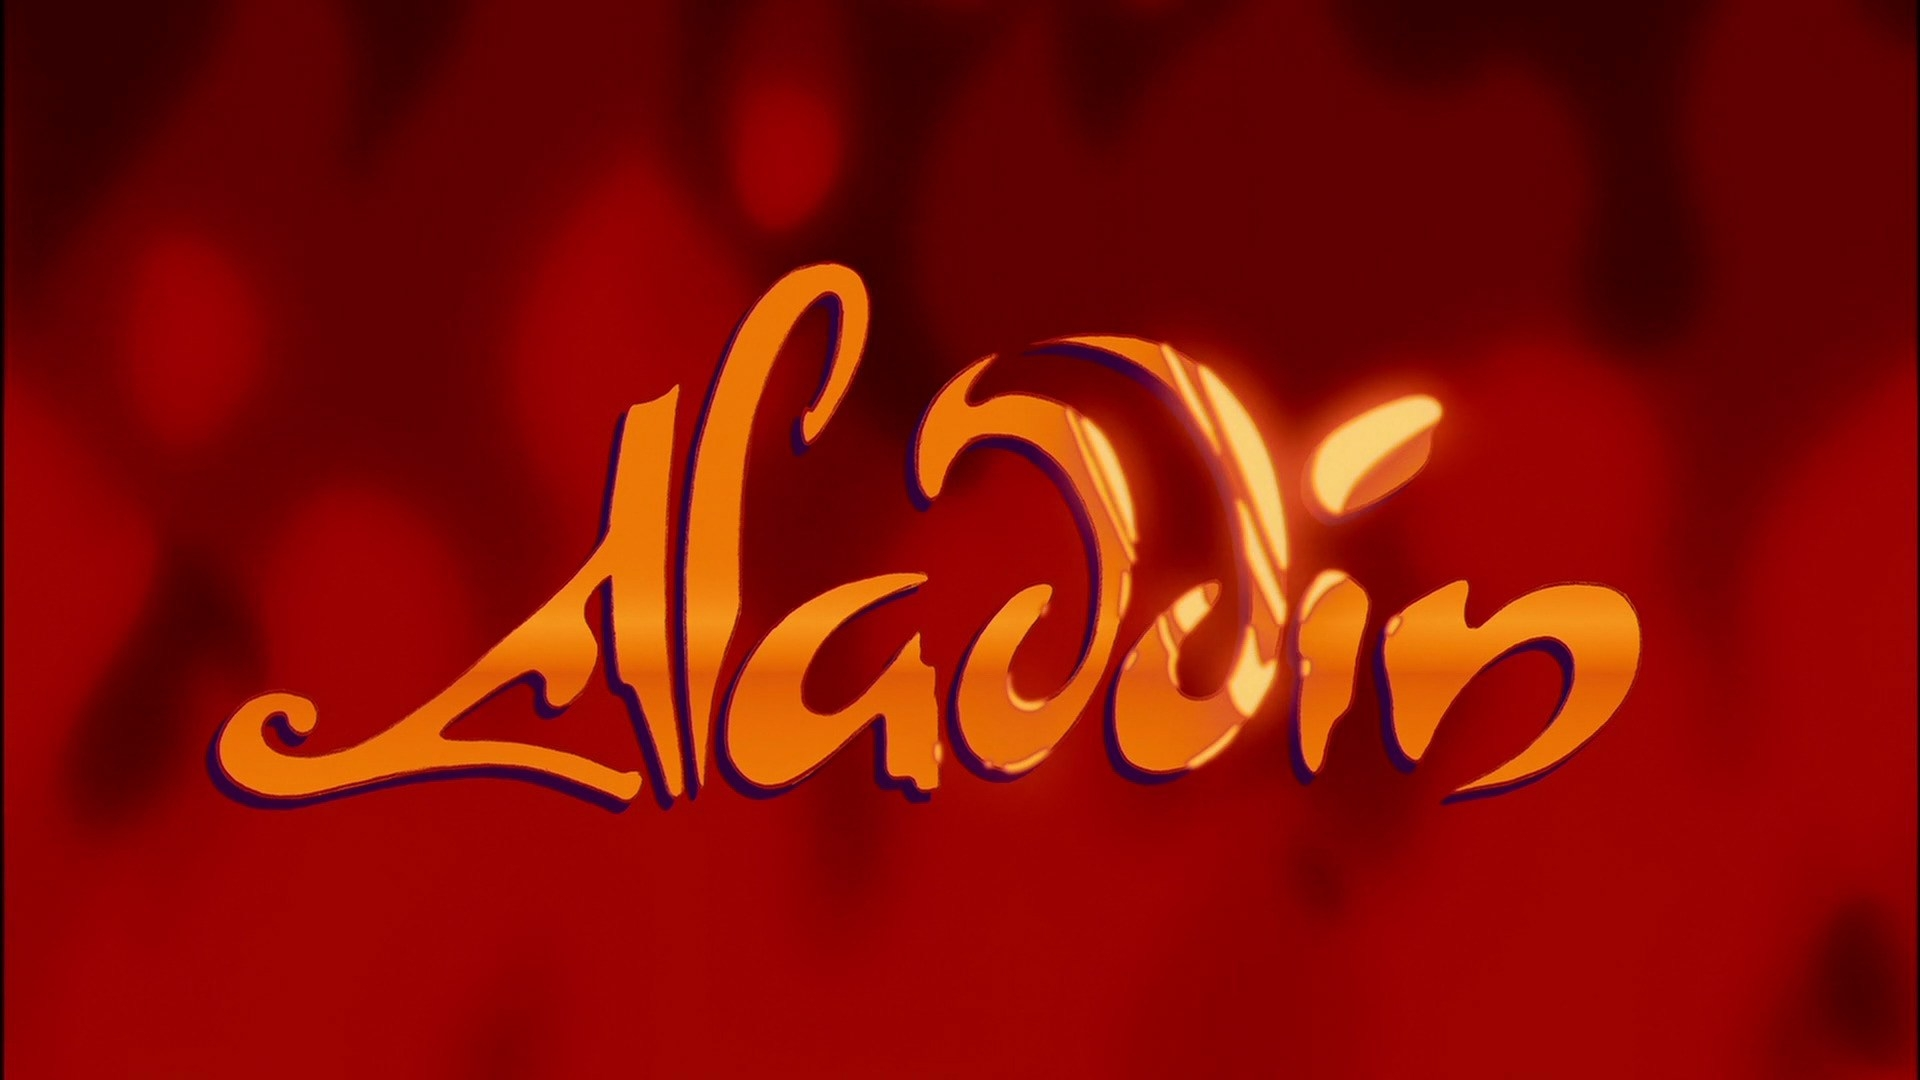 Aladdin (film) (@greendogsvalbard) Cover Image